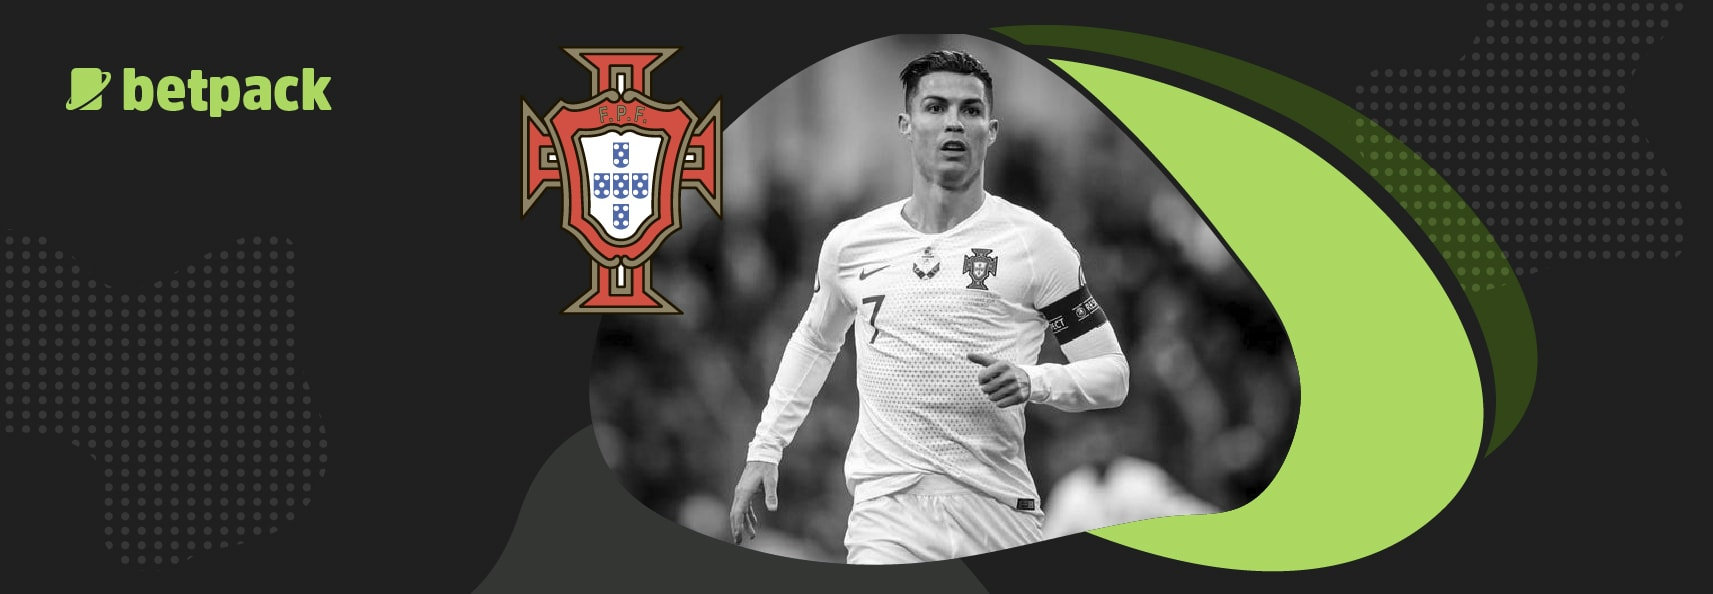 CR7 becomes all-time international top-scorer